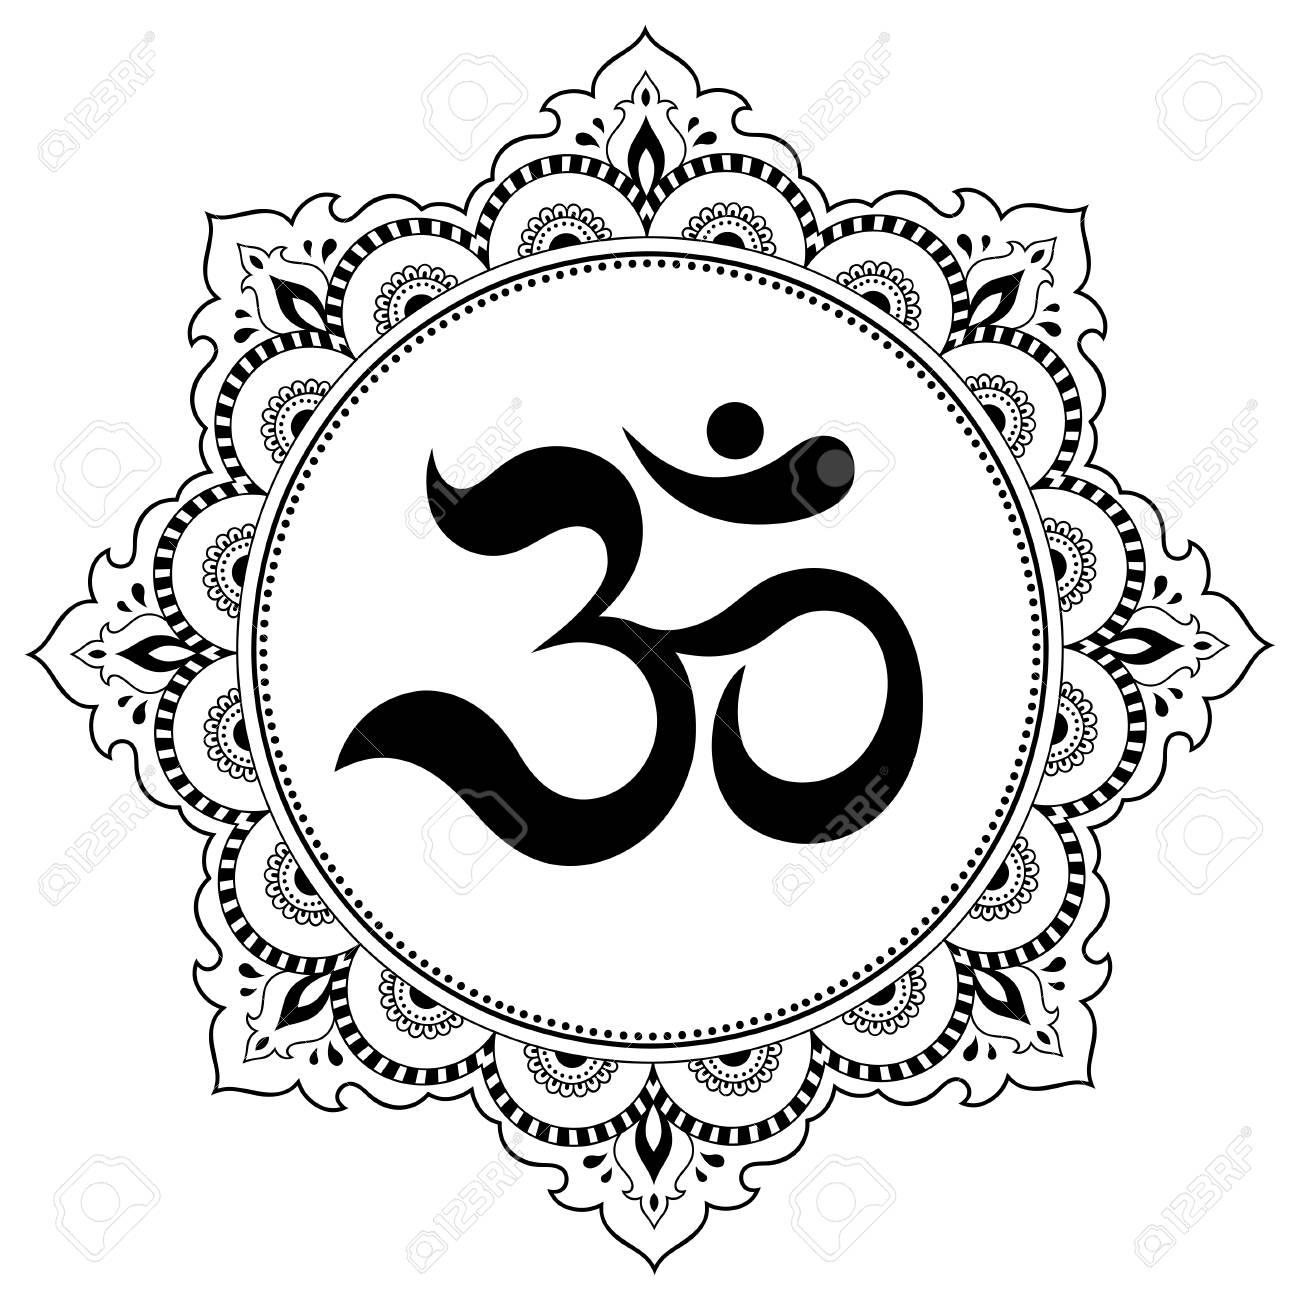 Circular pattern in the form of a mandala om decorative symbol circular pattern in the form of a mandala om decorative symbol mehndi style buycottarizona